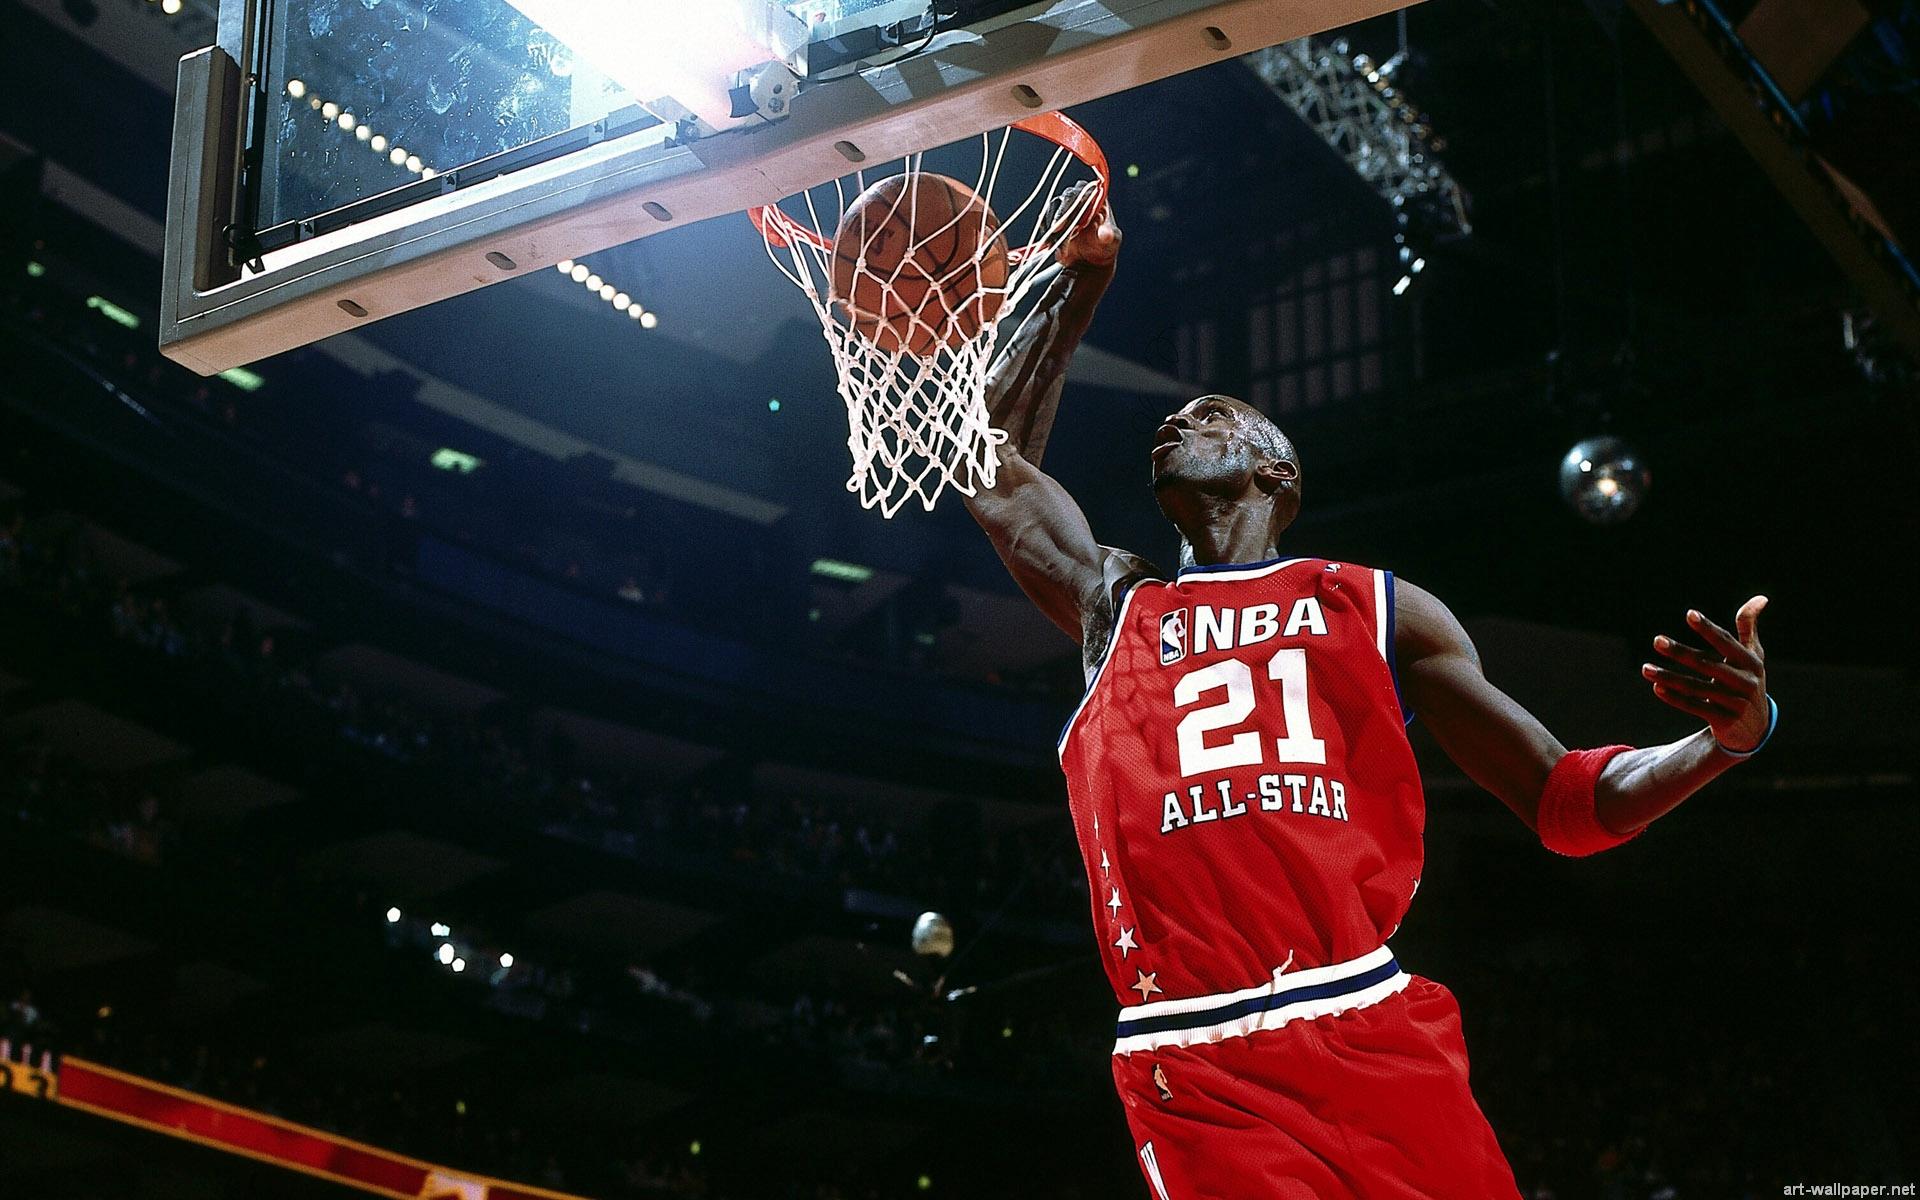 42+ NBA HD Wallpapers 1080p on WallpaperSafari